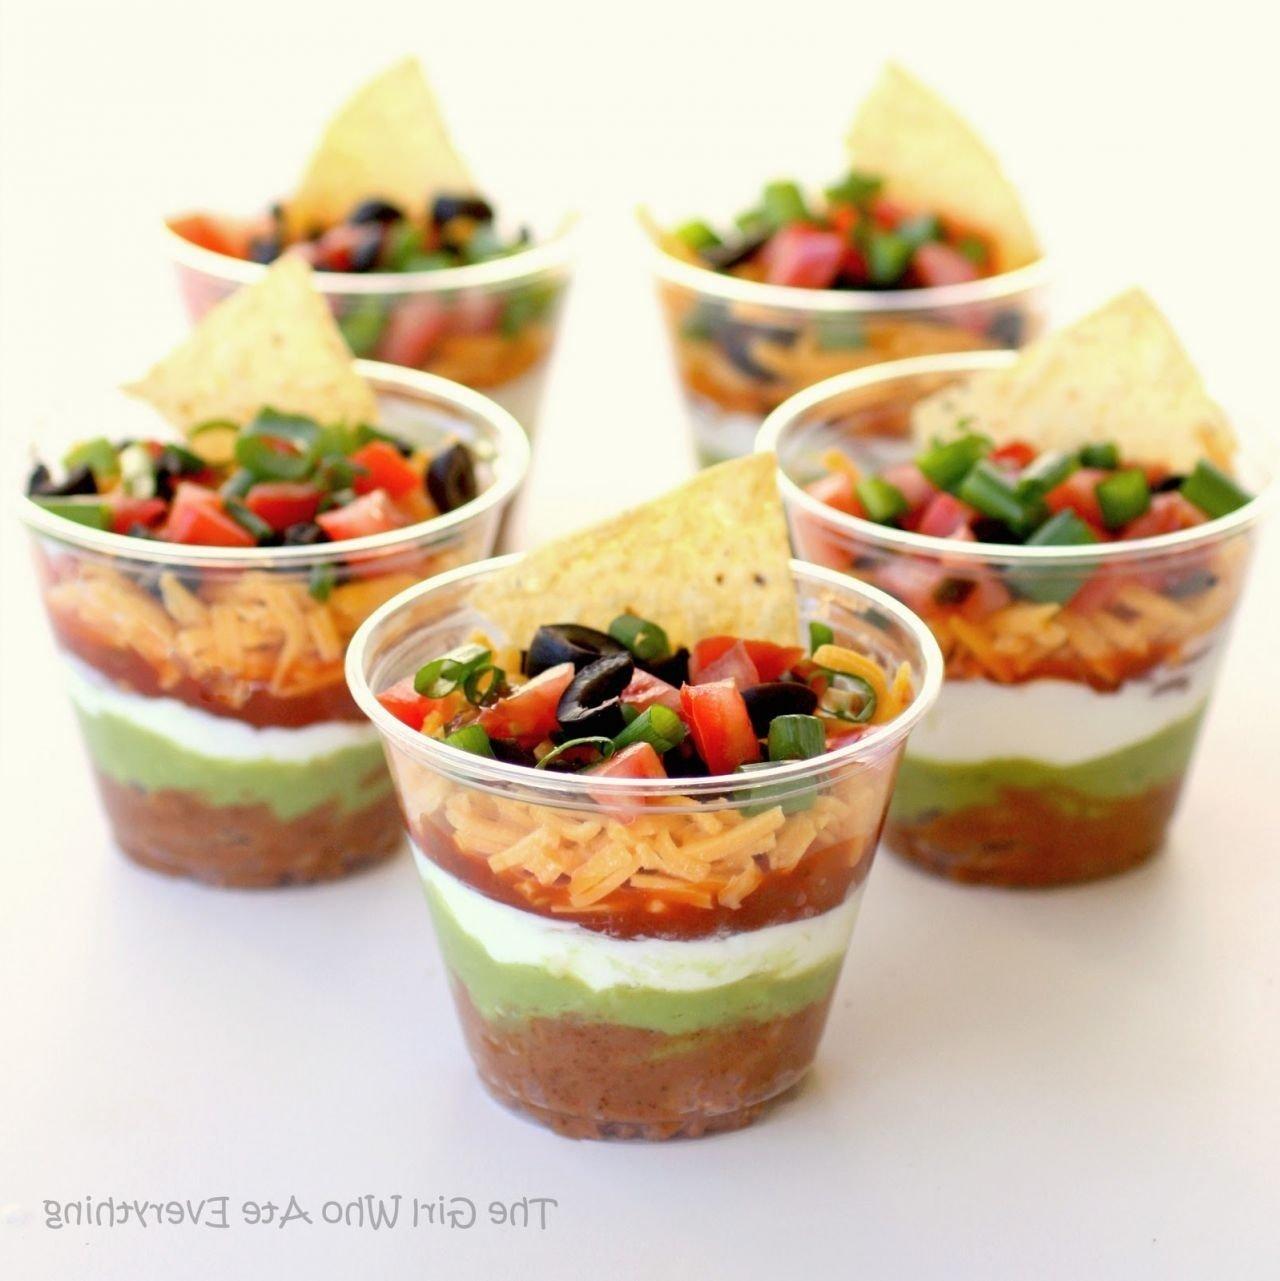 10 Fabulous Easy Graduation Party Food Ideas graduation party food ideas graduation party finger food ideas 4 2021